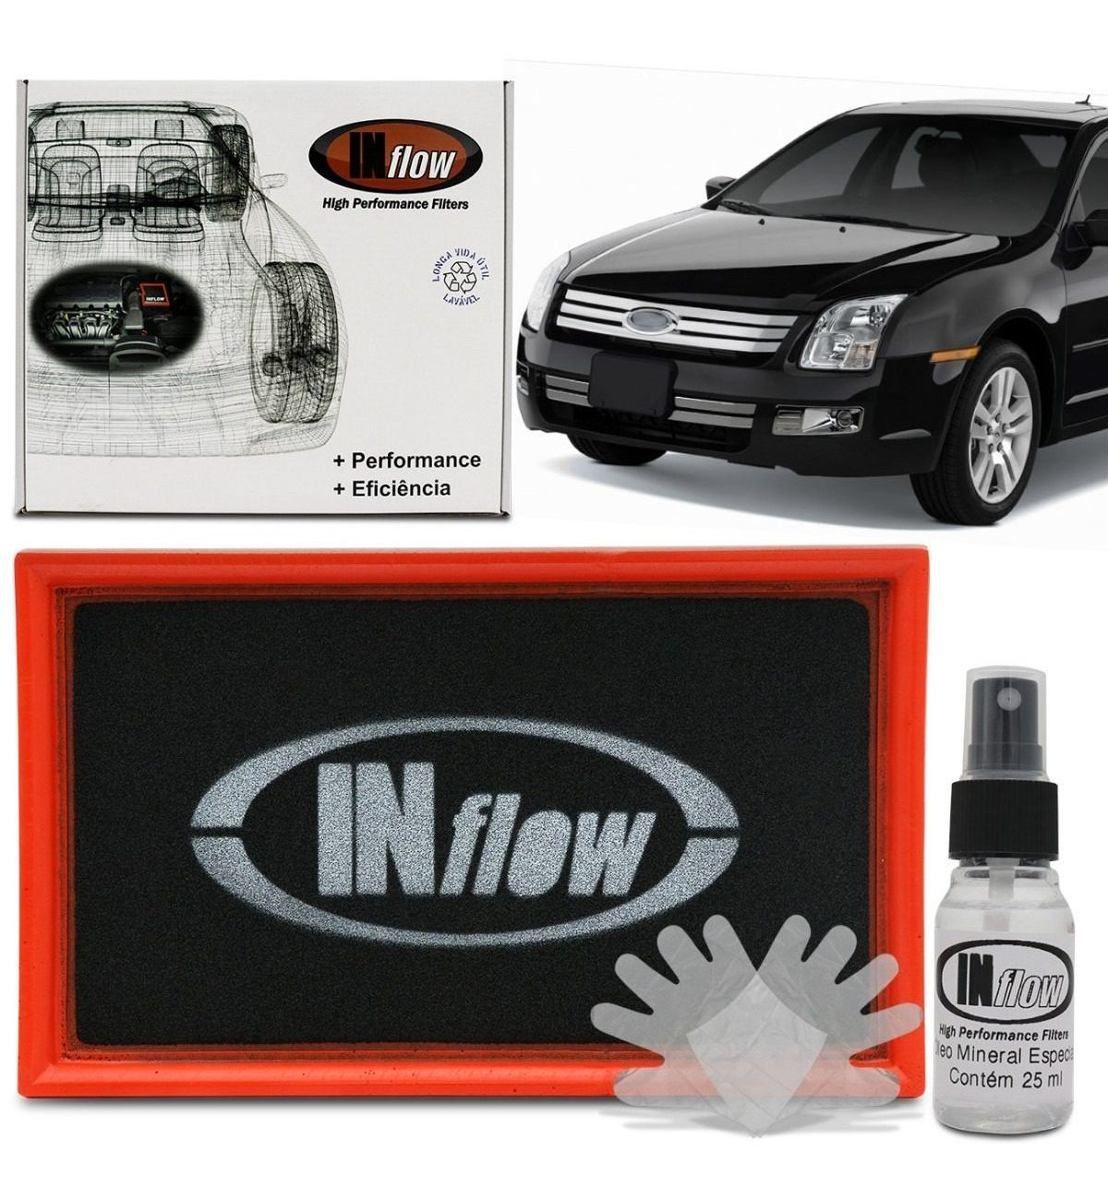 Filtro De Ar Esportivo Inflow Ford Fusion 2.3 e 2.5 Hpf2400